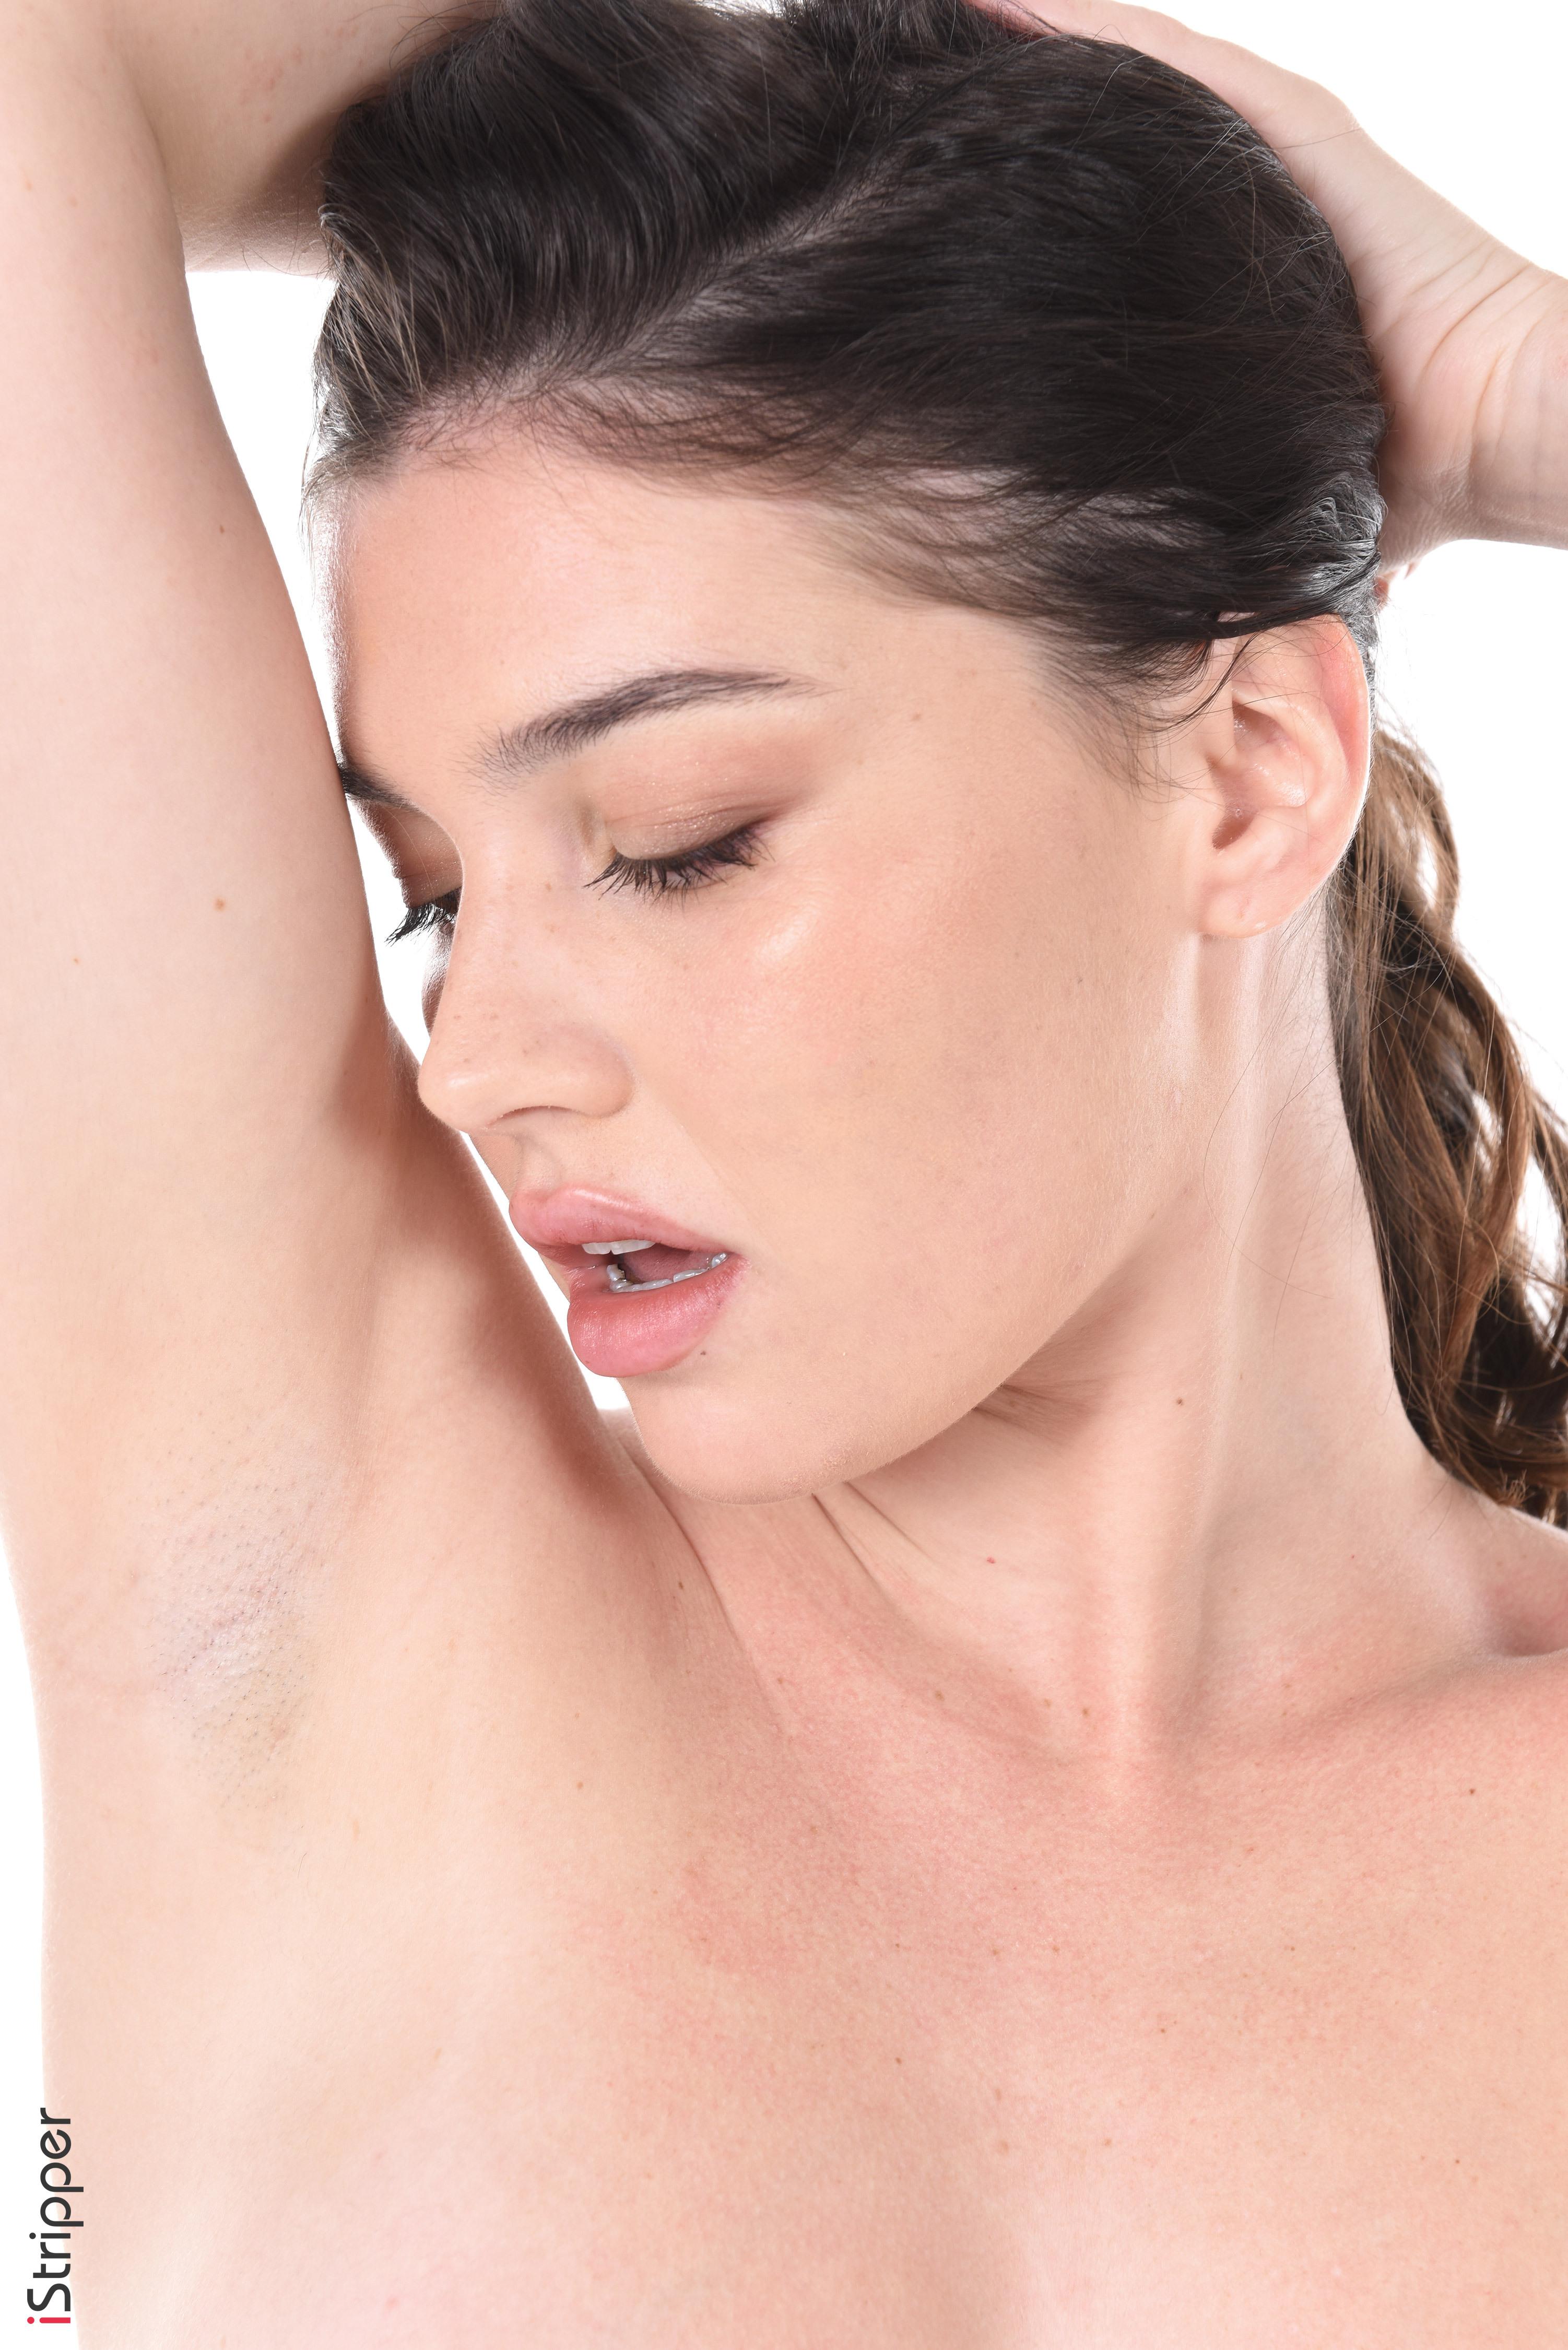 sexy striptease in web cam